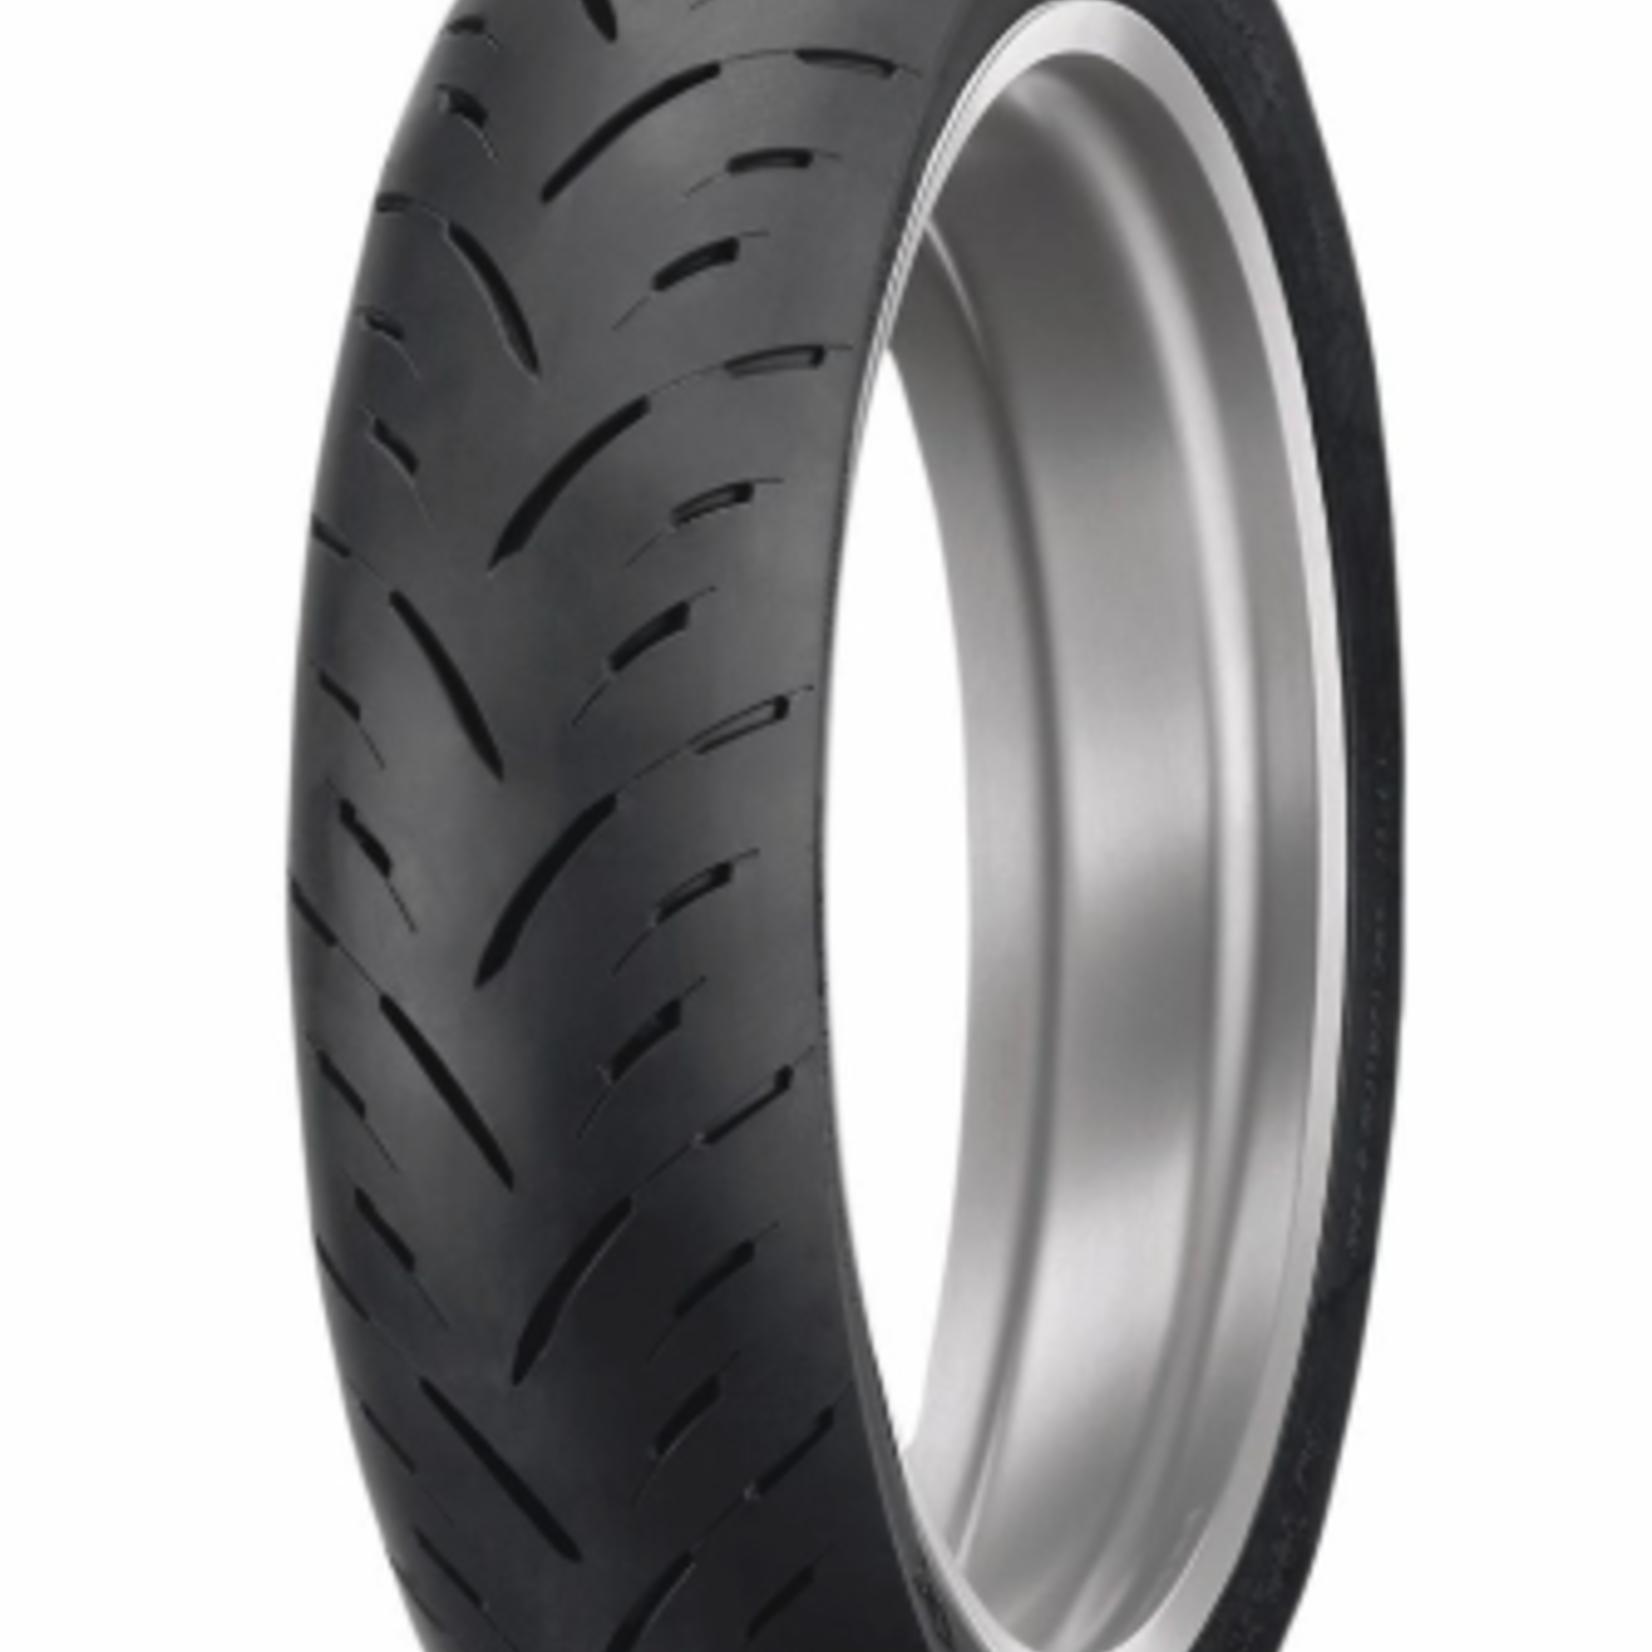 Dunlop Dunlop Sportmax GPR300 Rear Tire - 190/50-17